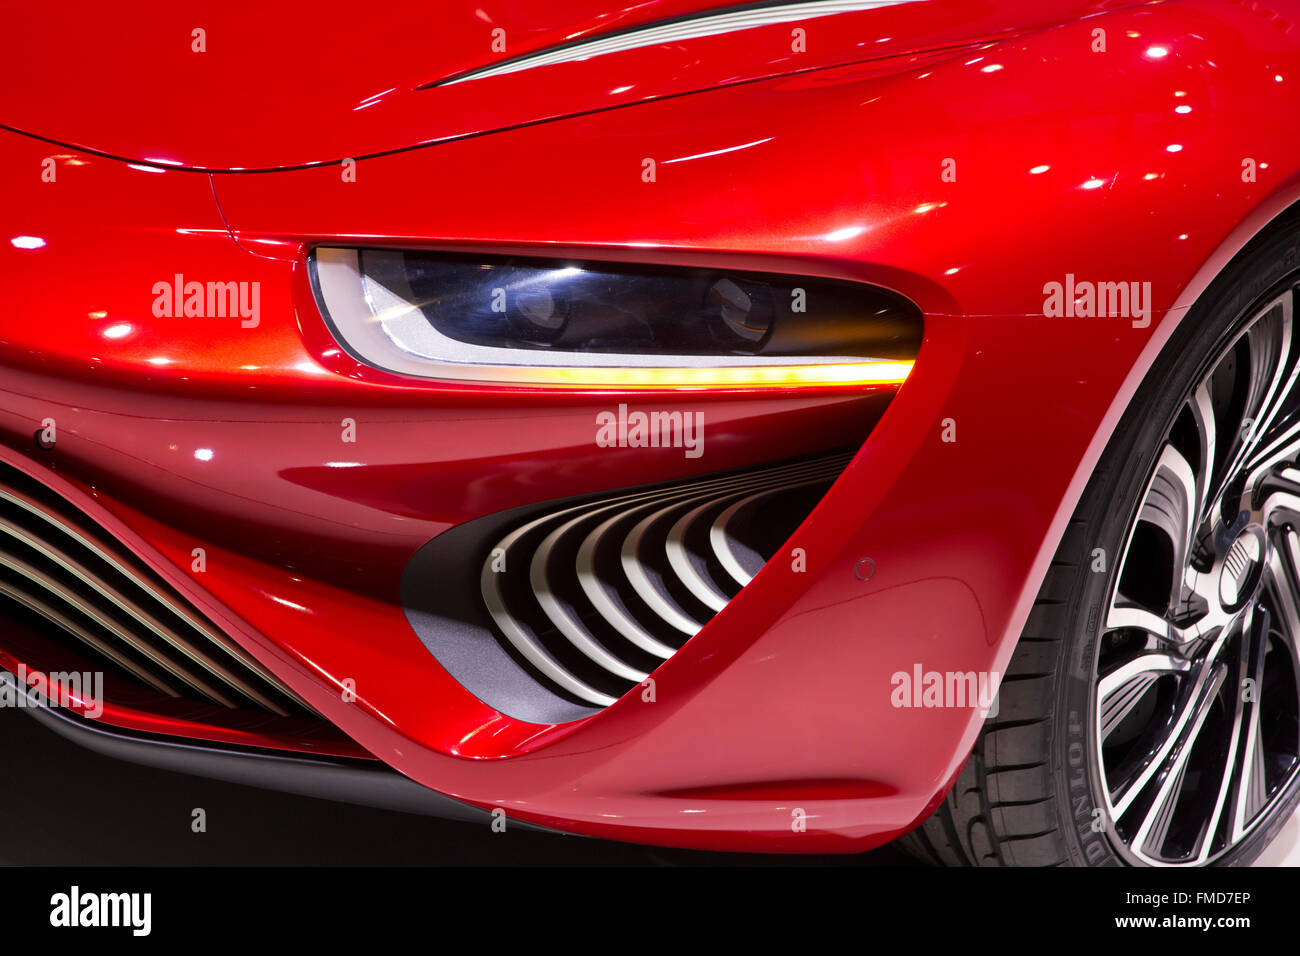 NanoFlowcell QUANT FE electric flow cell car at the Geneva Motor Show 2016 - Stock Image